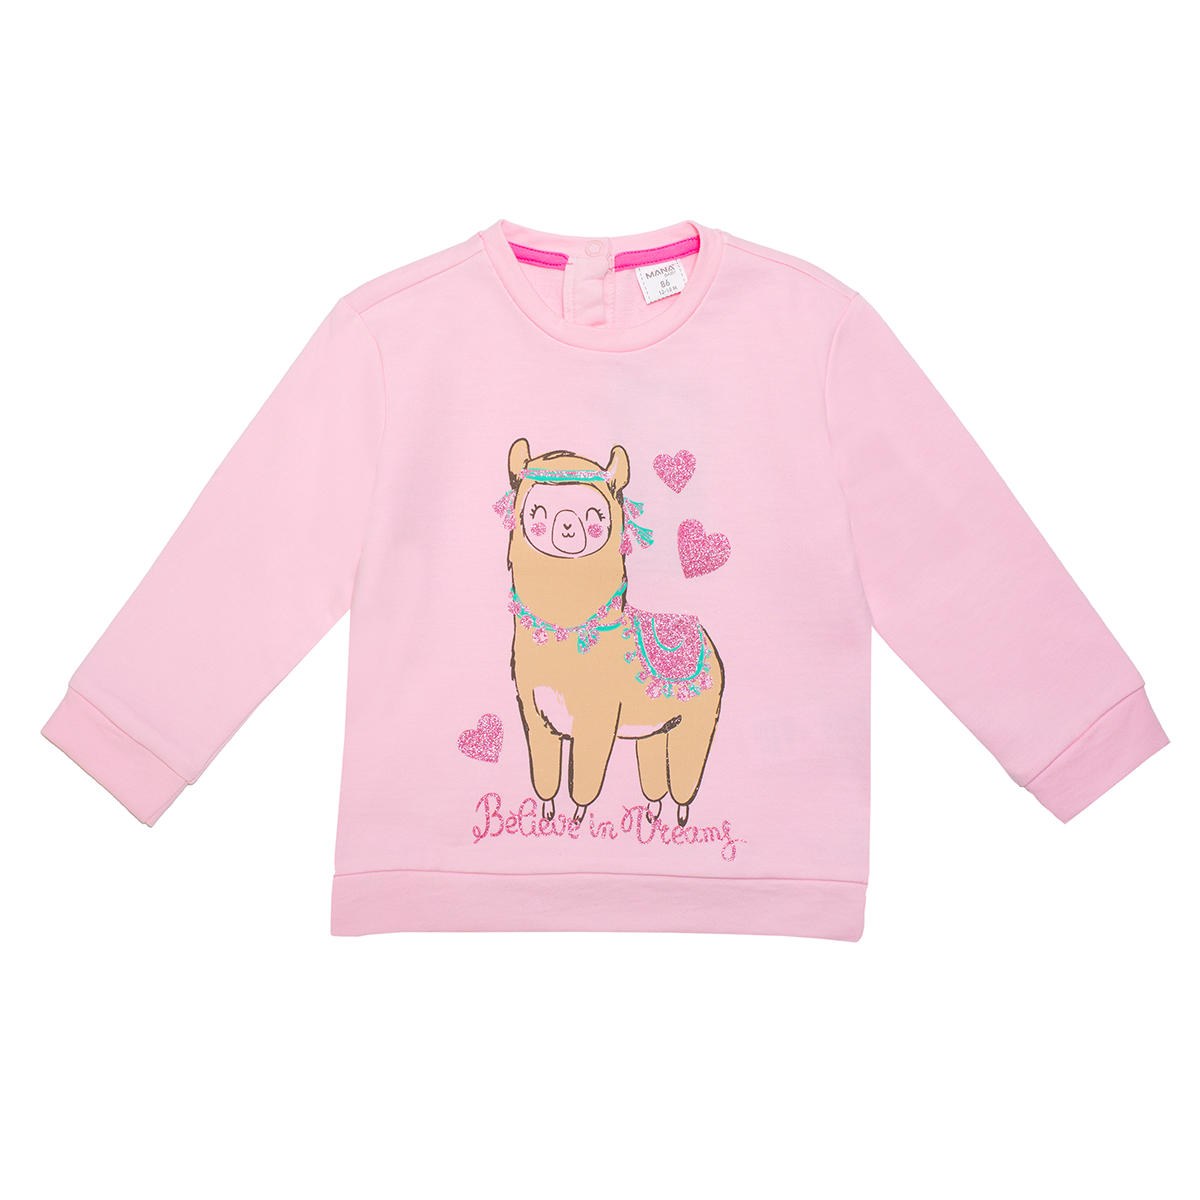 Baby pulover, svetlo roza